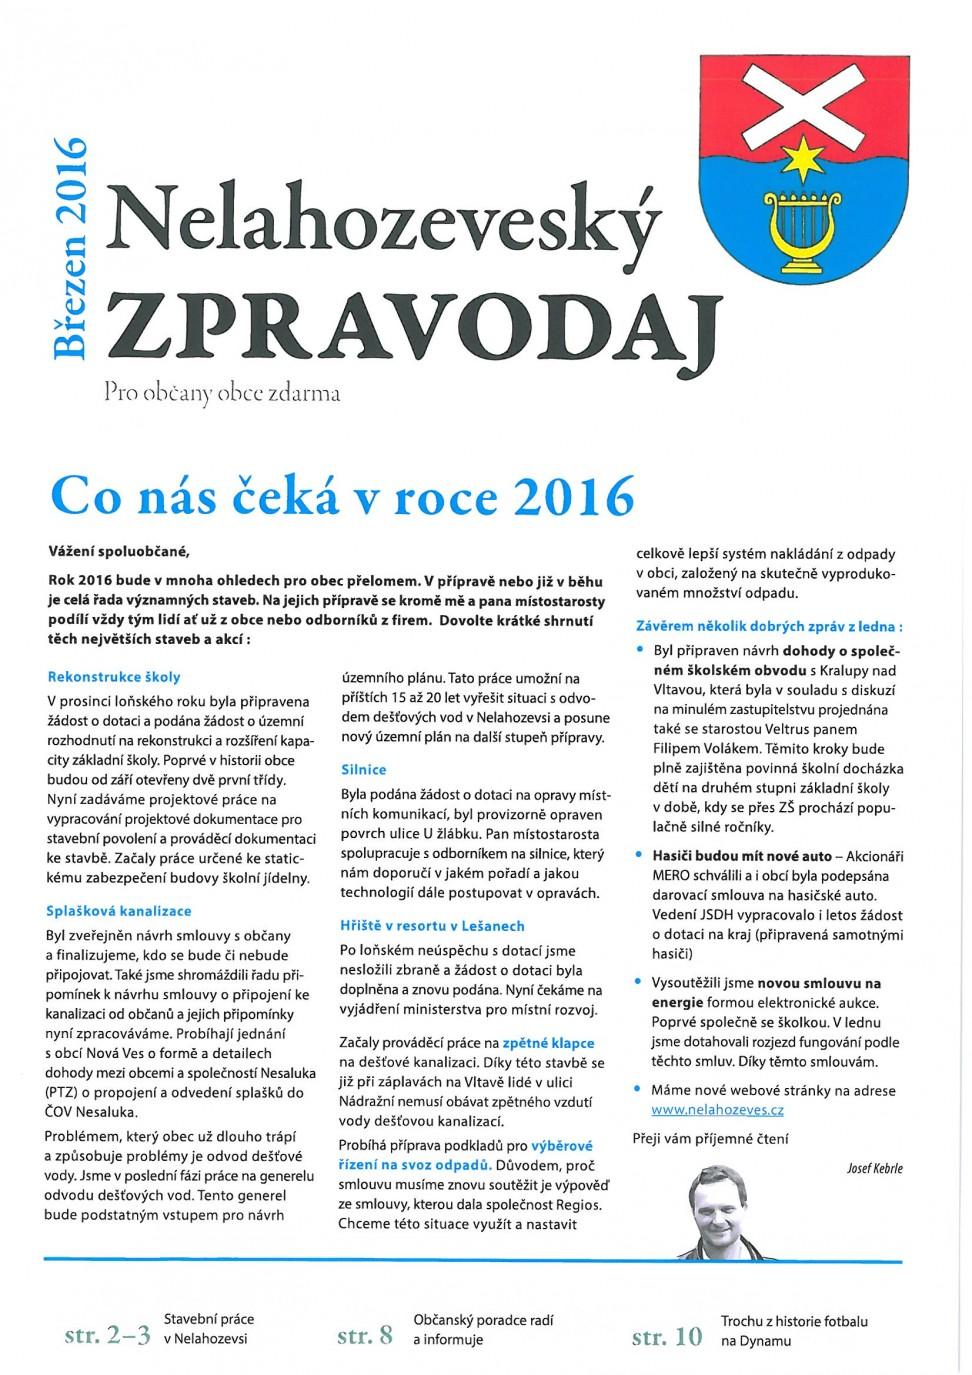 Zpravodaj - březen 2016